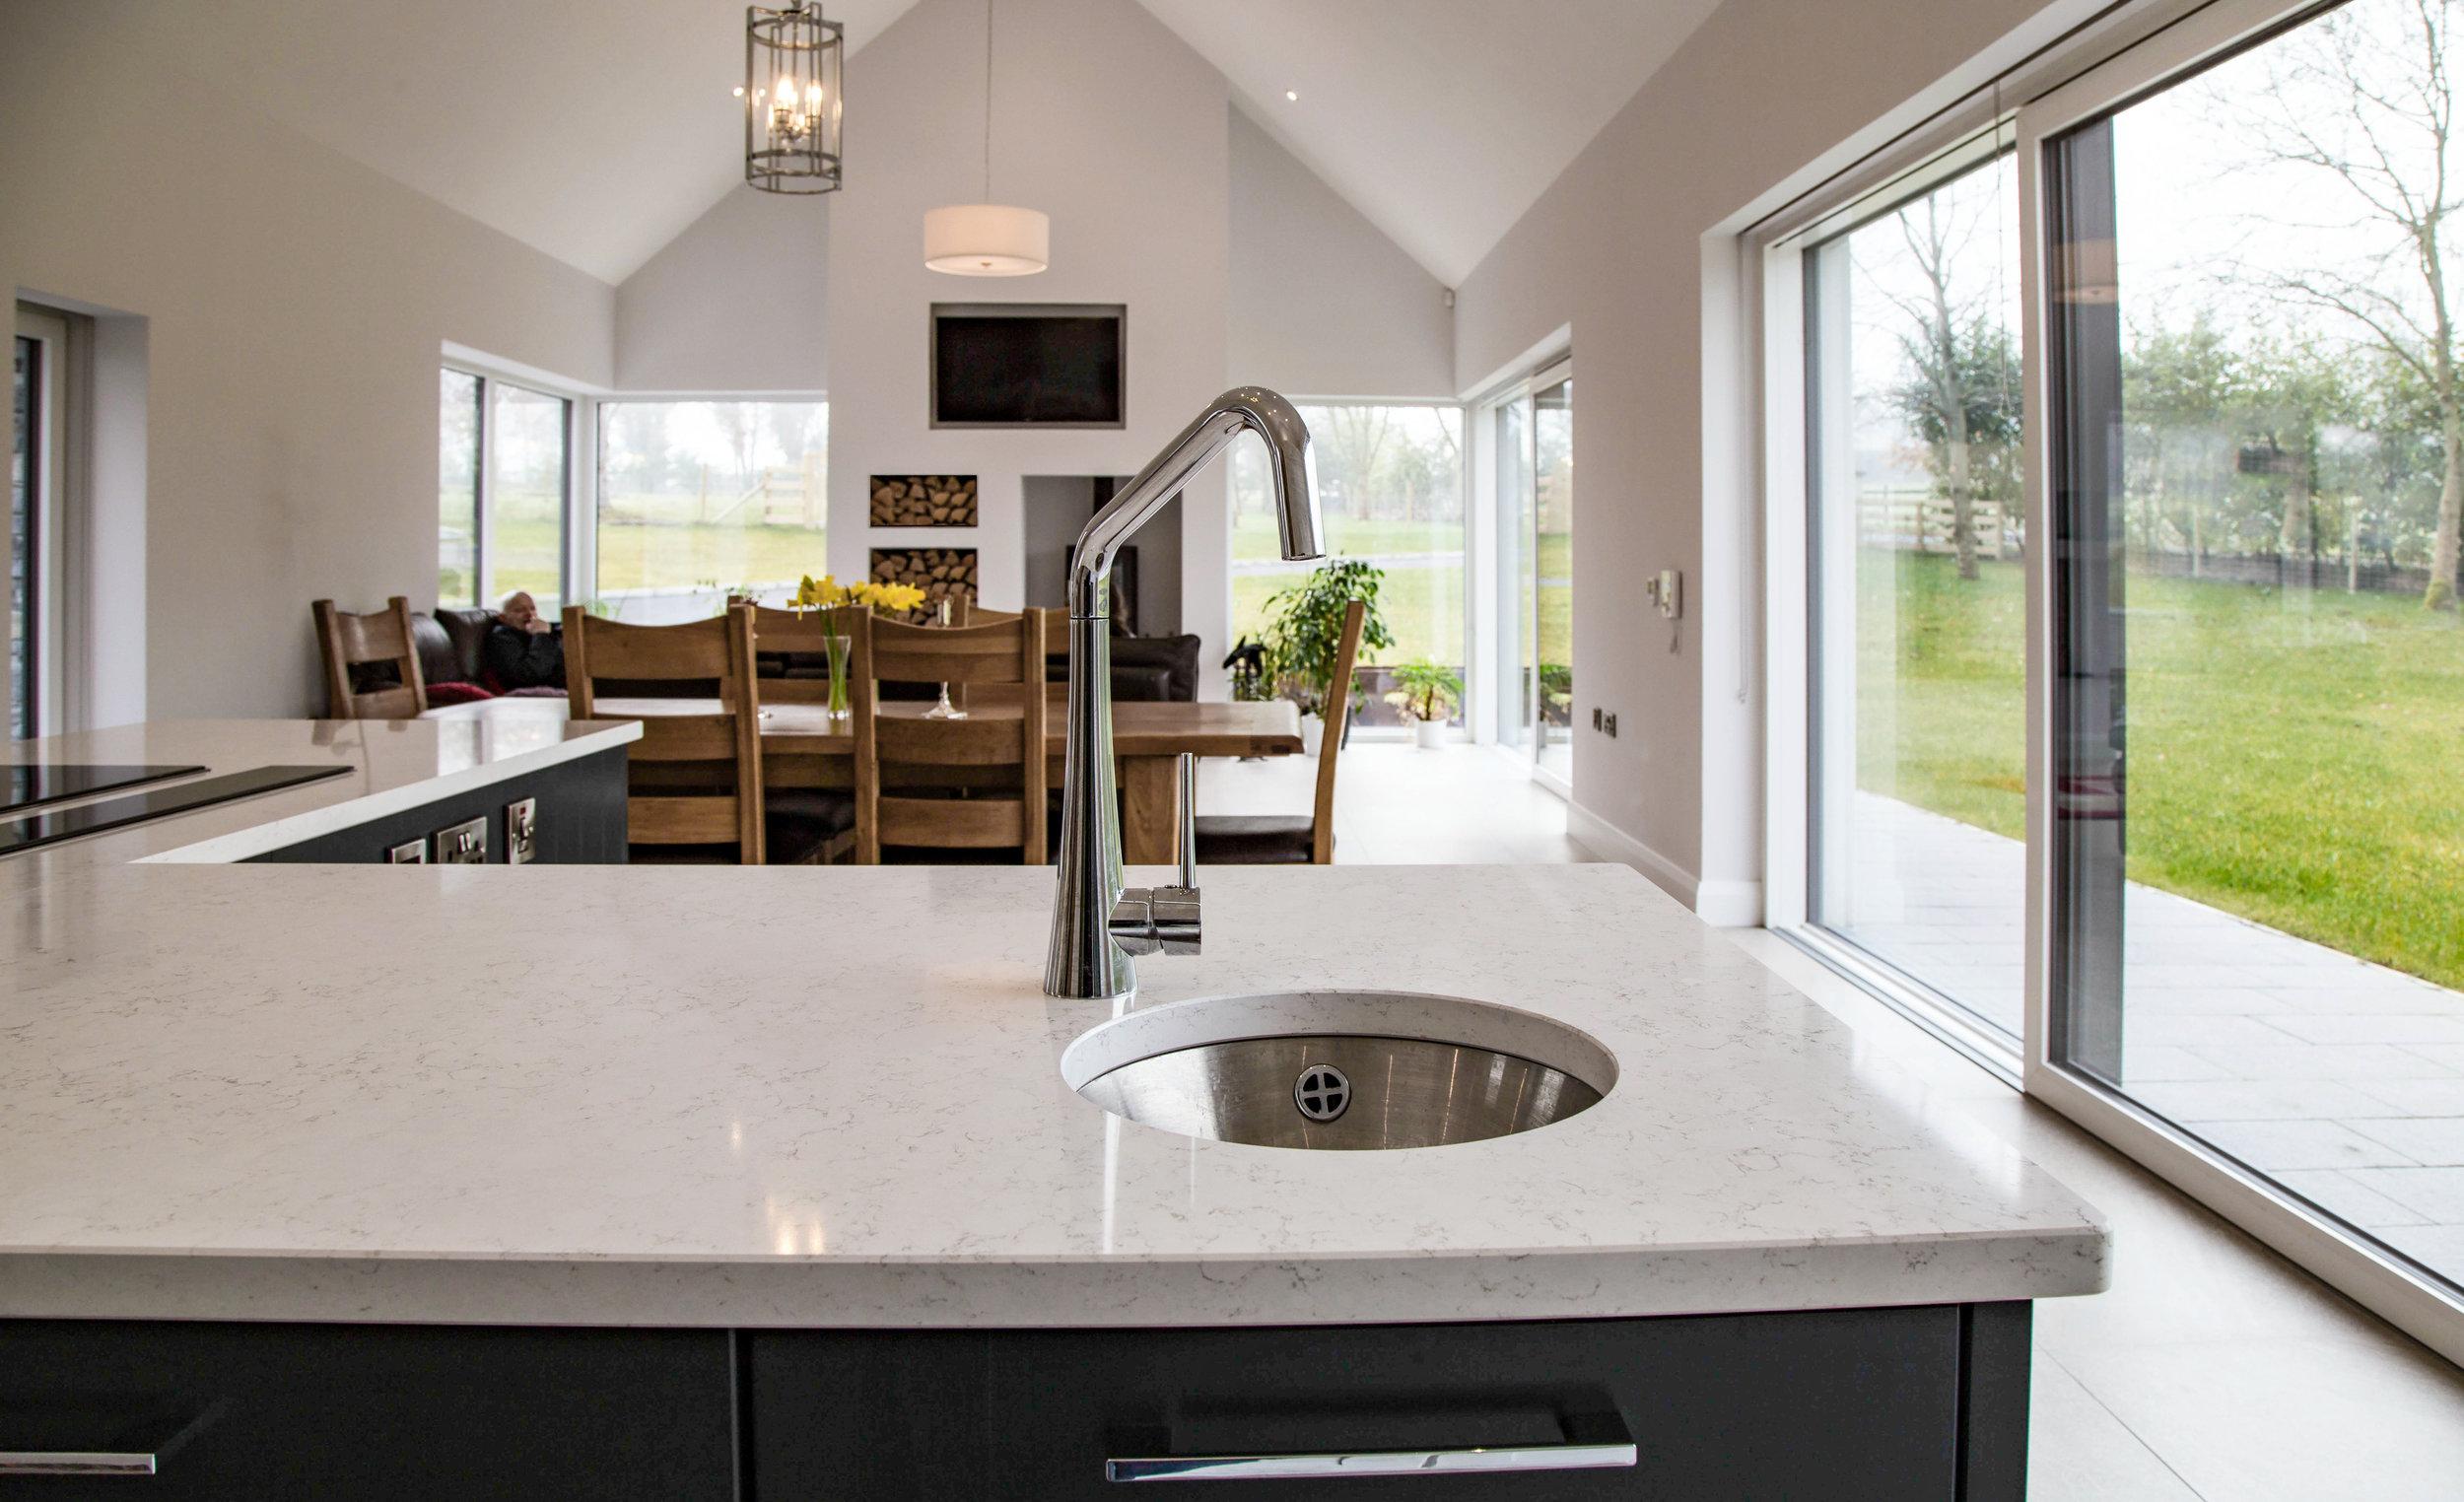 Paul_McAlister_Architects_Passive_House_Kitchen-2.jpg